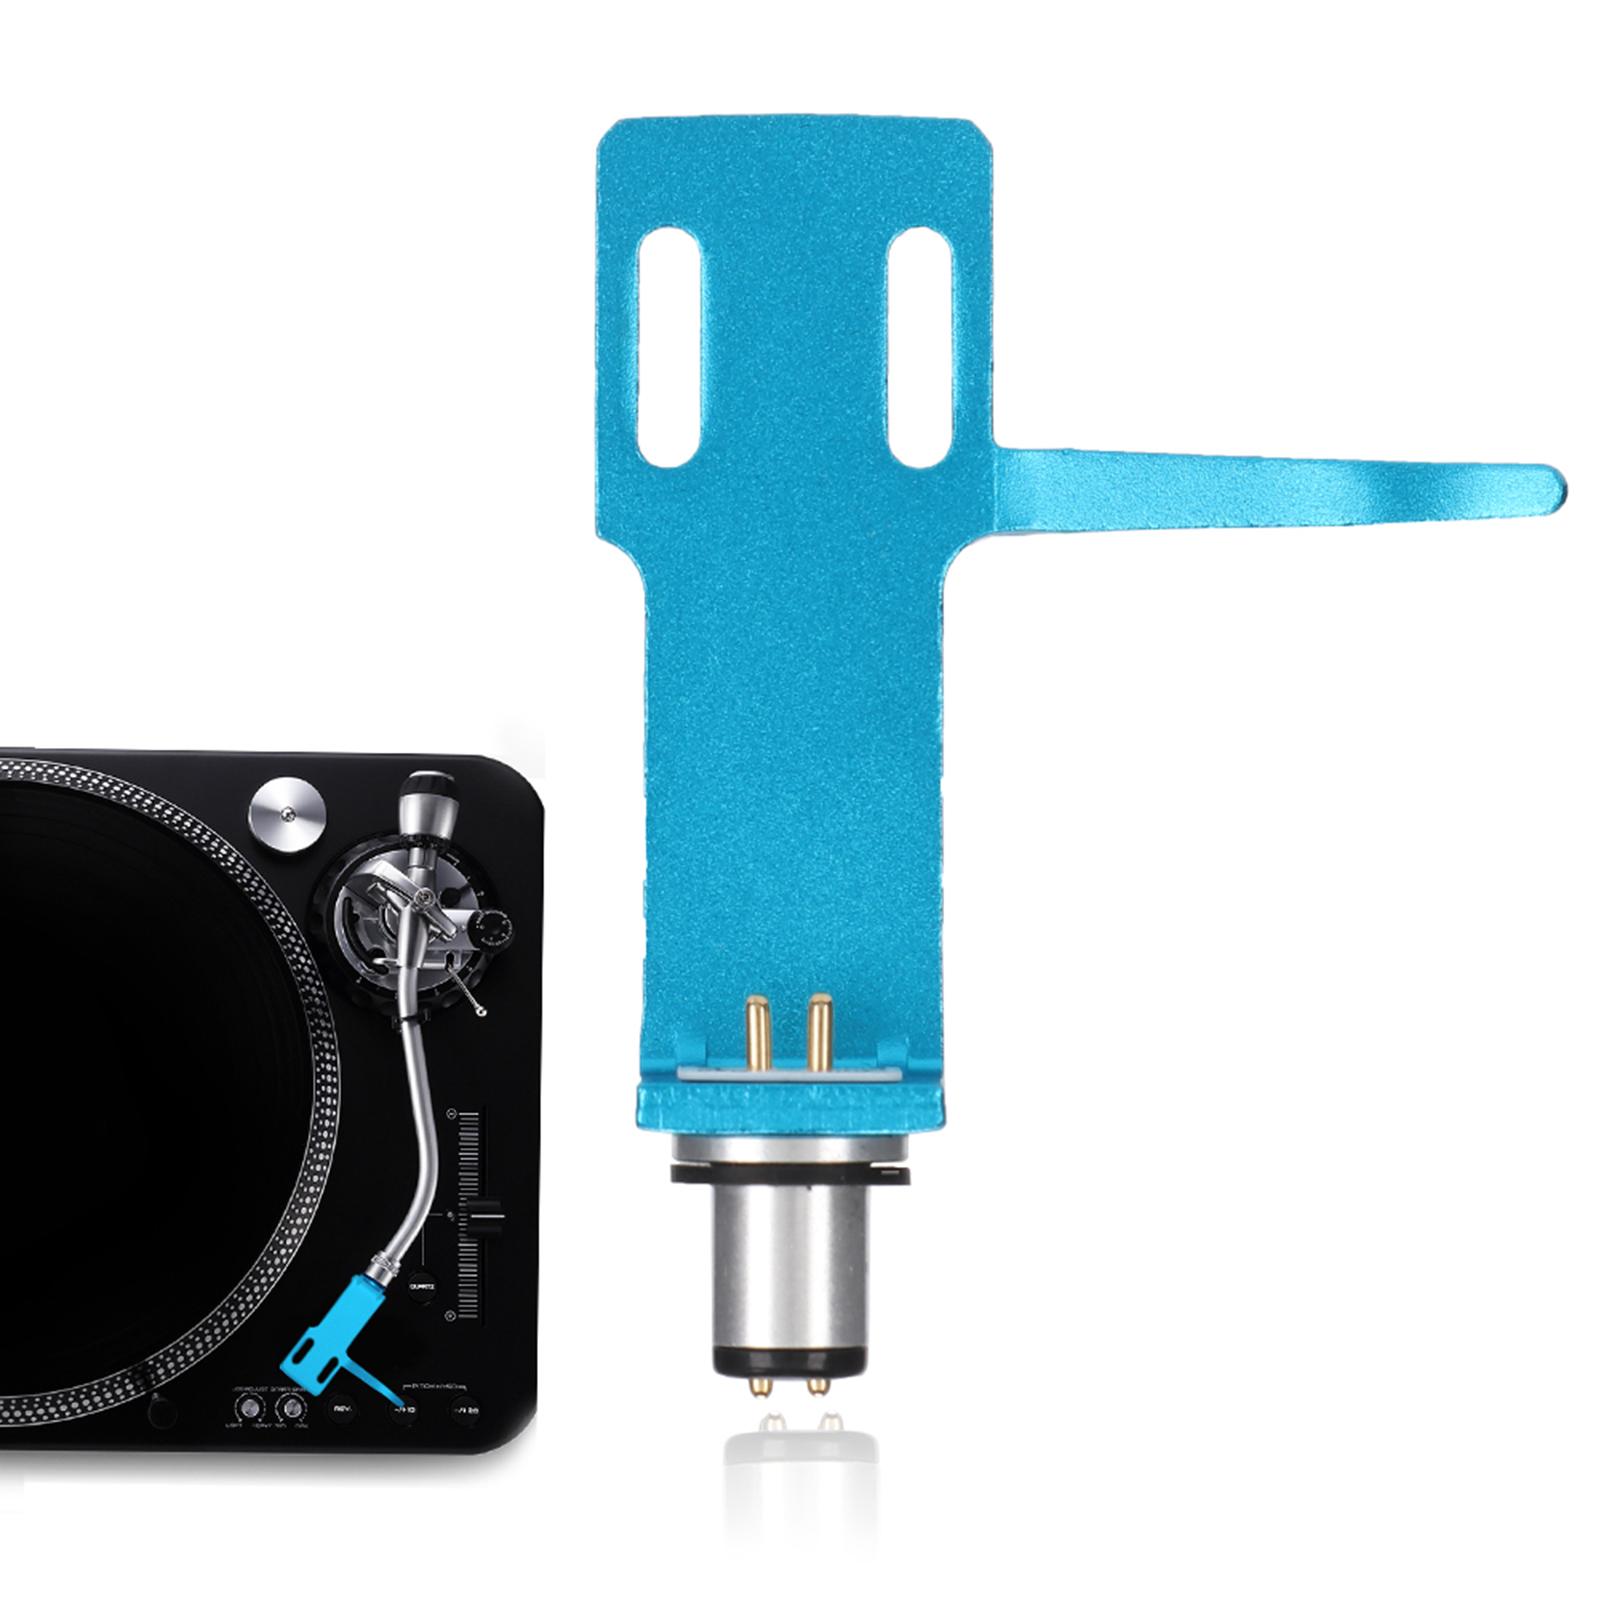 Universal-Phono-Stylus-Holder-Headshell-Cartridge-Keeper-for-LP-Record-Player thumbnail 25